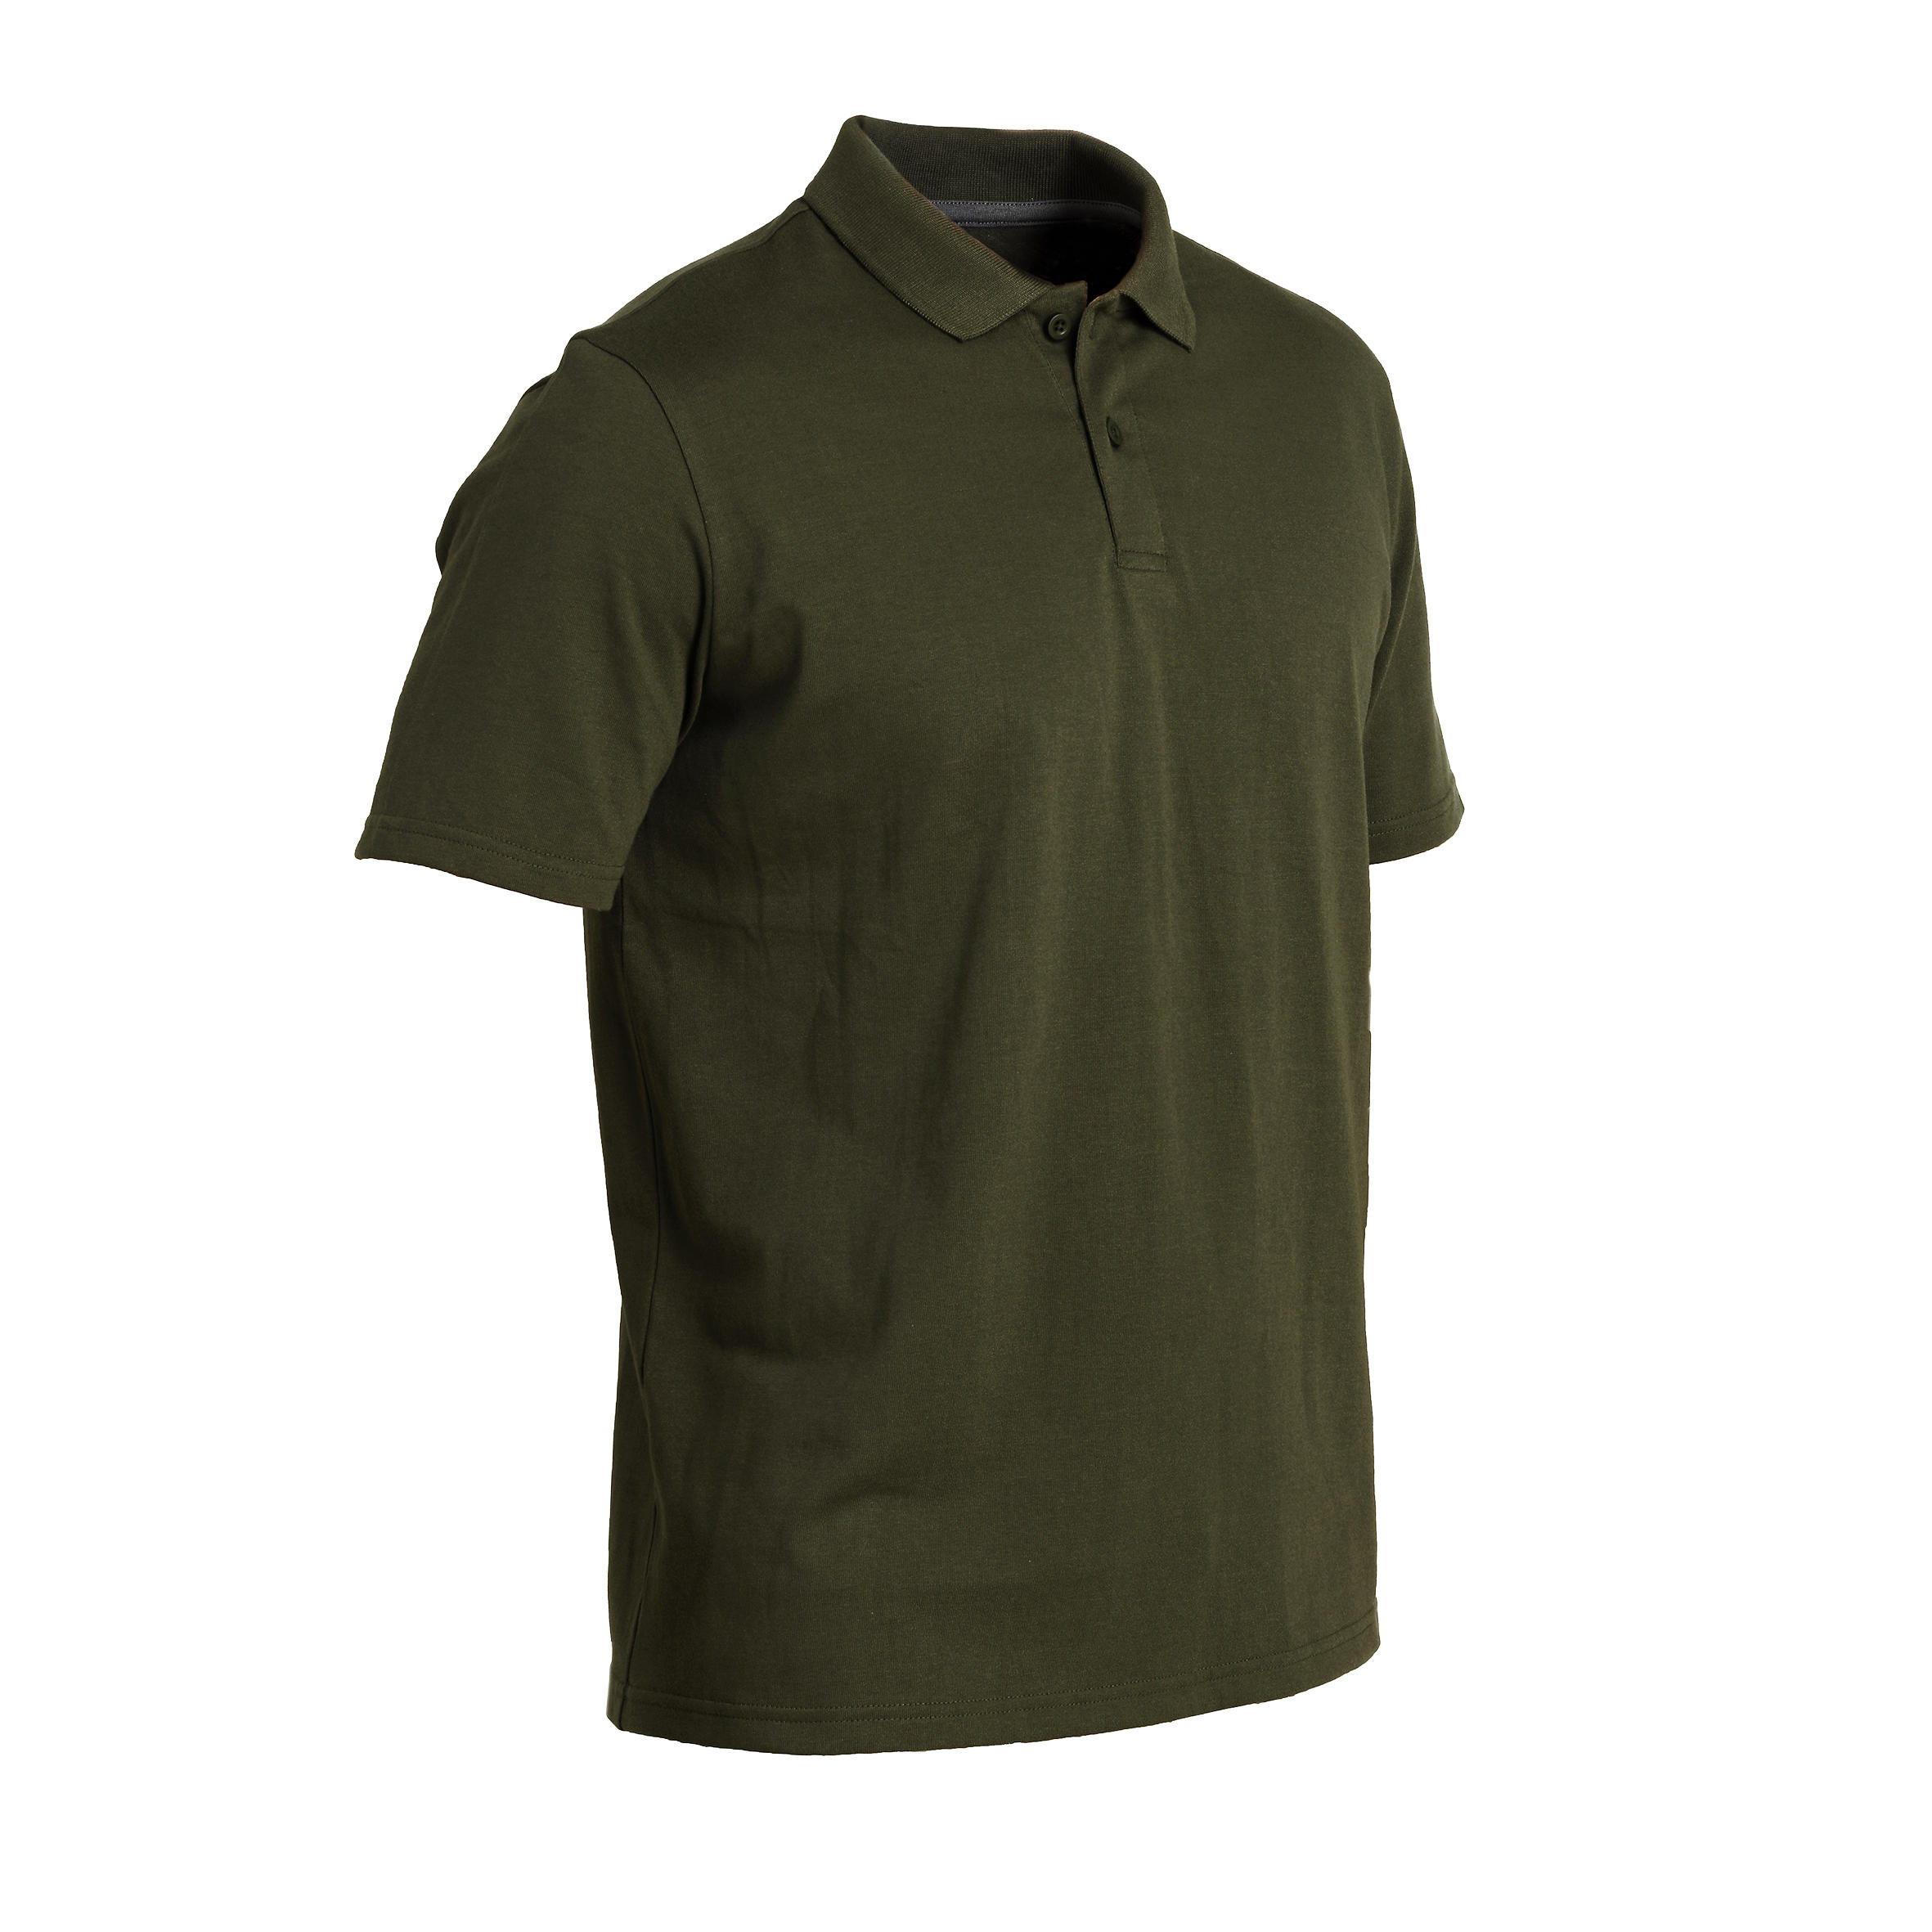 Men's Polo T-Shirt...